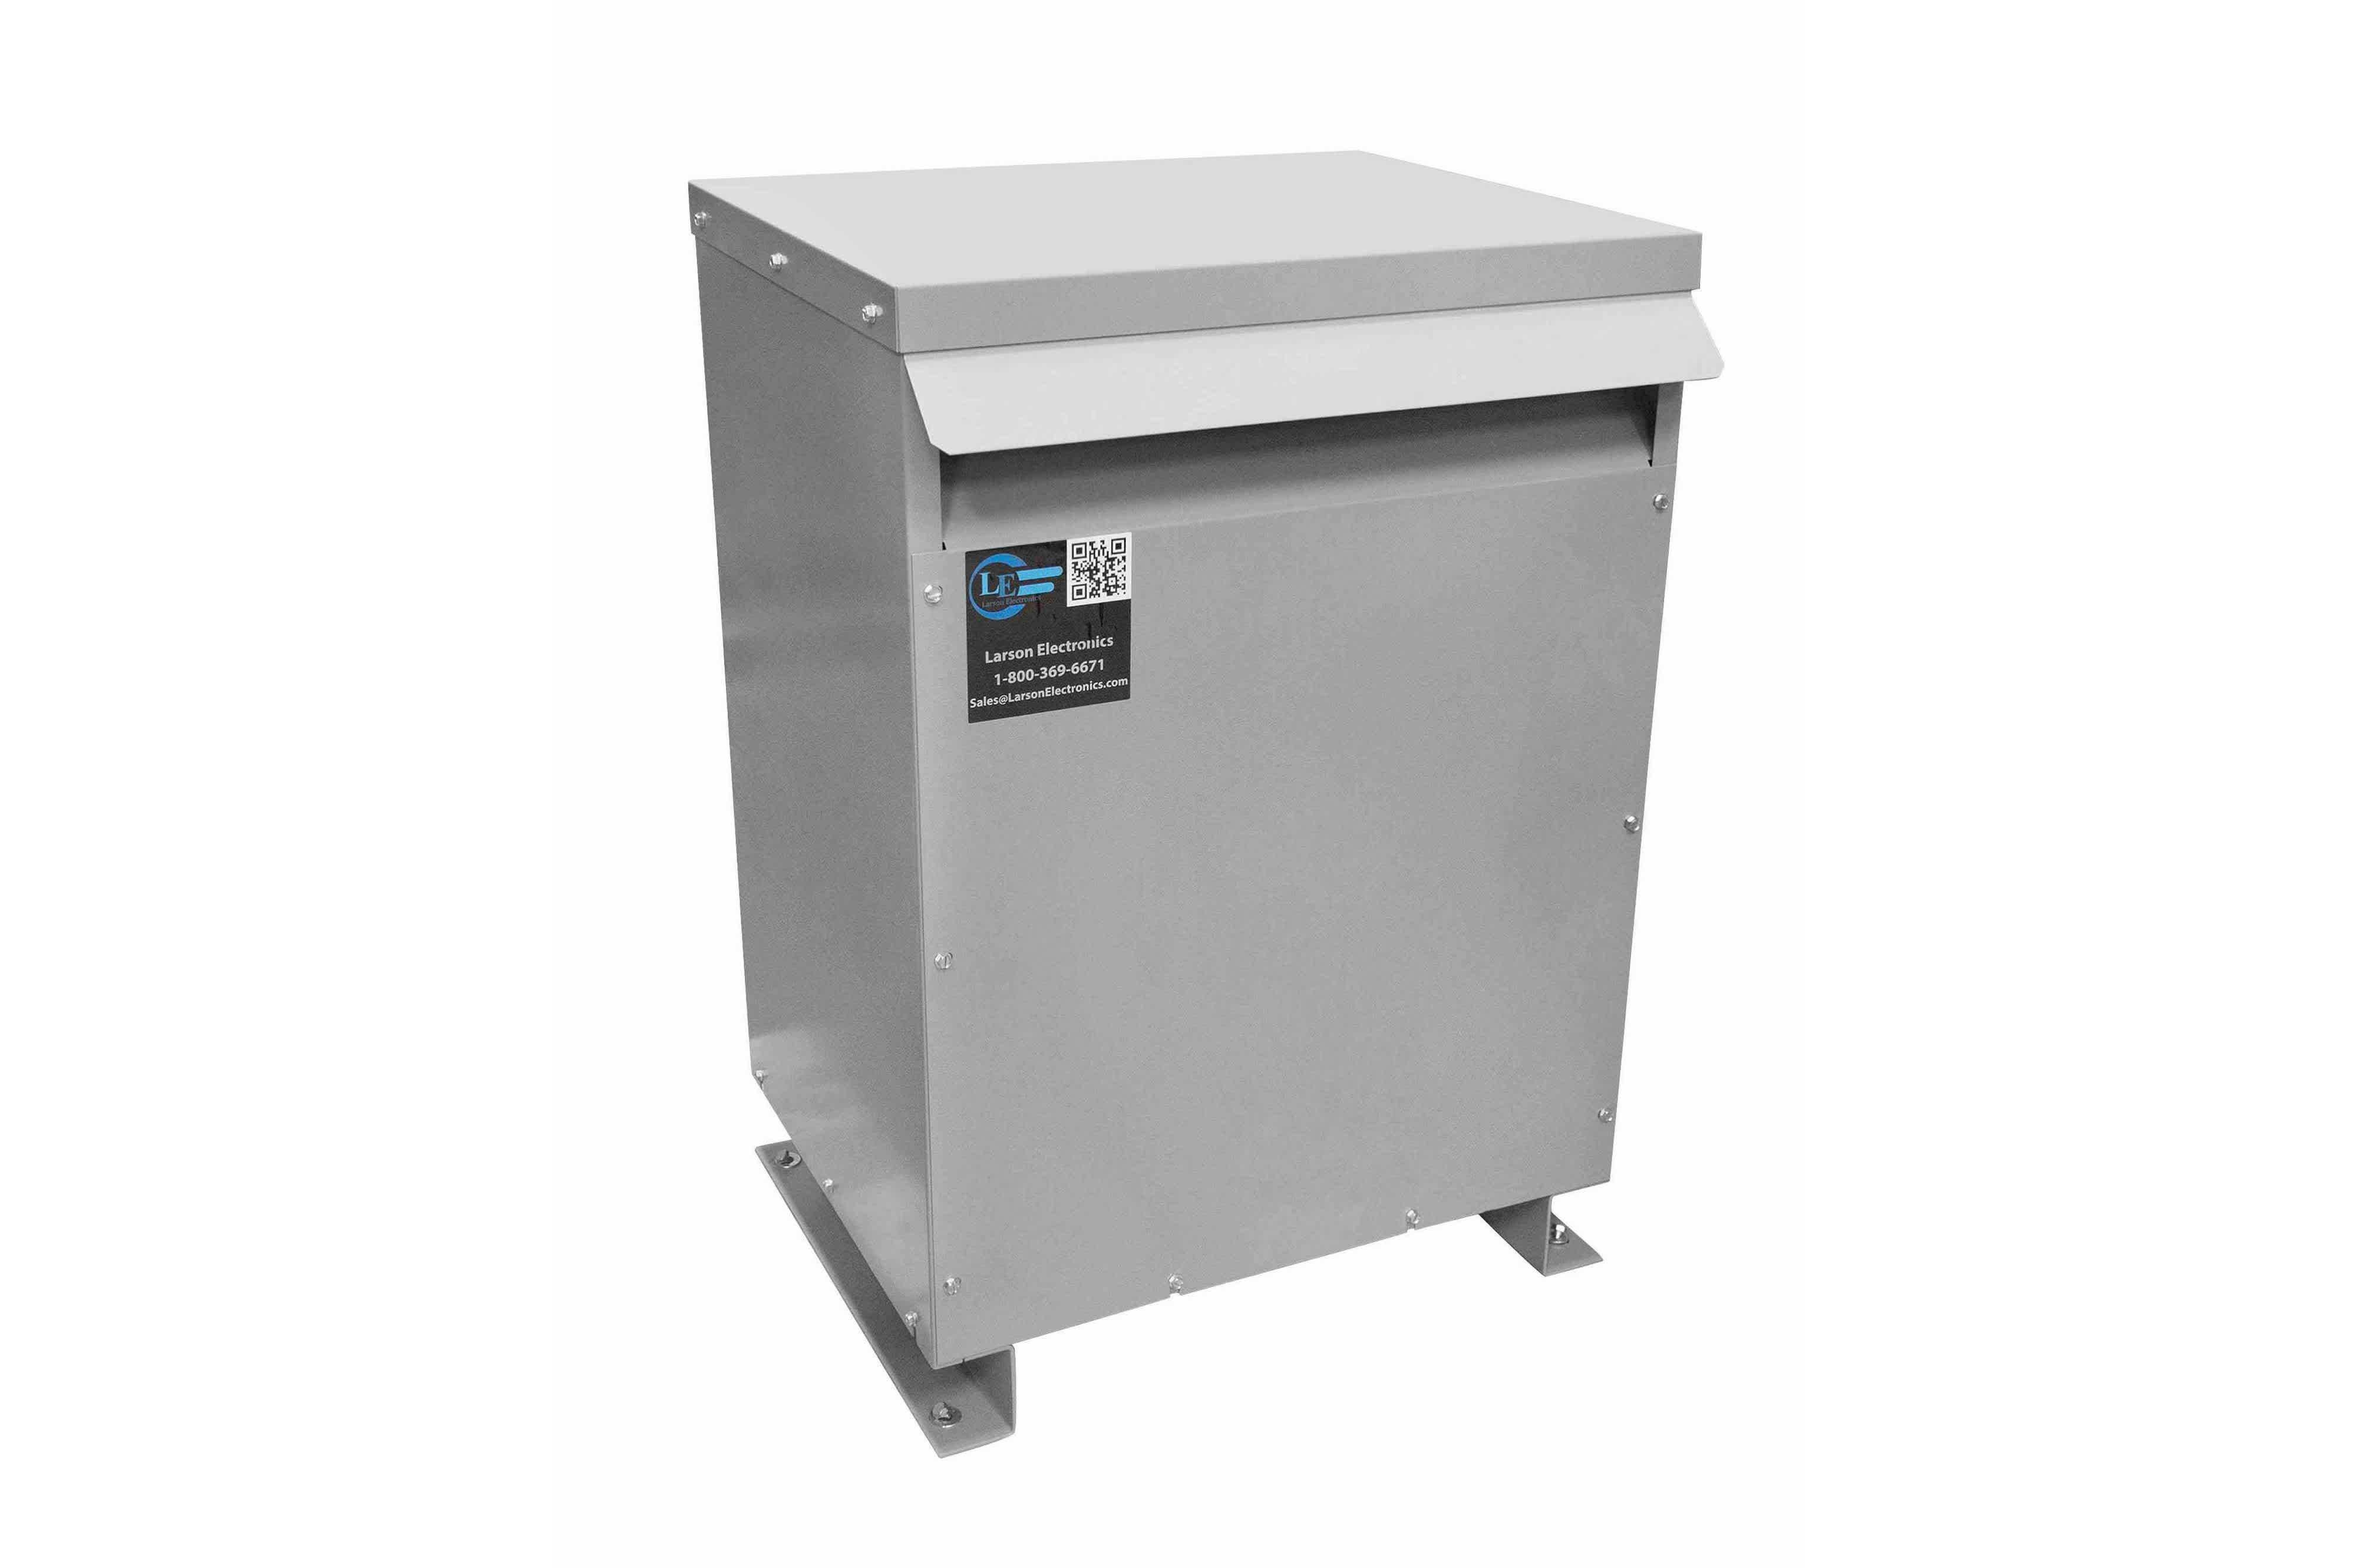 27 kVA 3PH Isolation Transformer, 600V Wye Primary, 480V Delta Secondary, N3R, Ventilated, 60 Hz